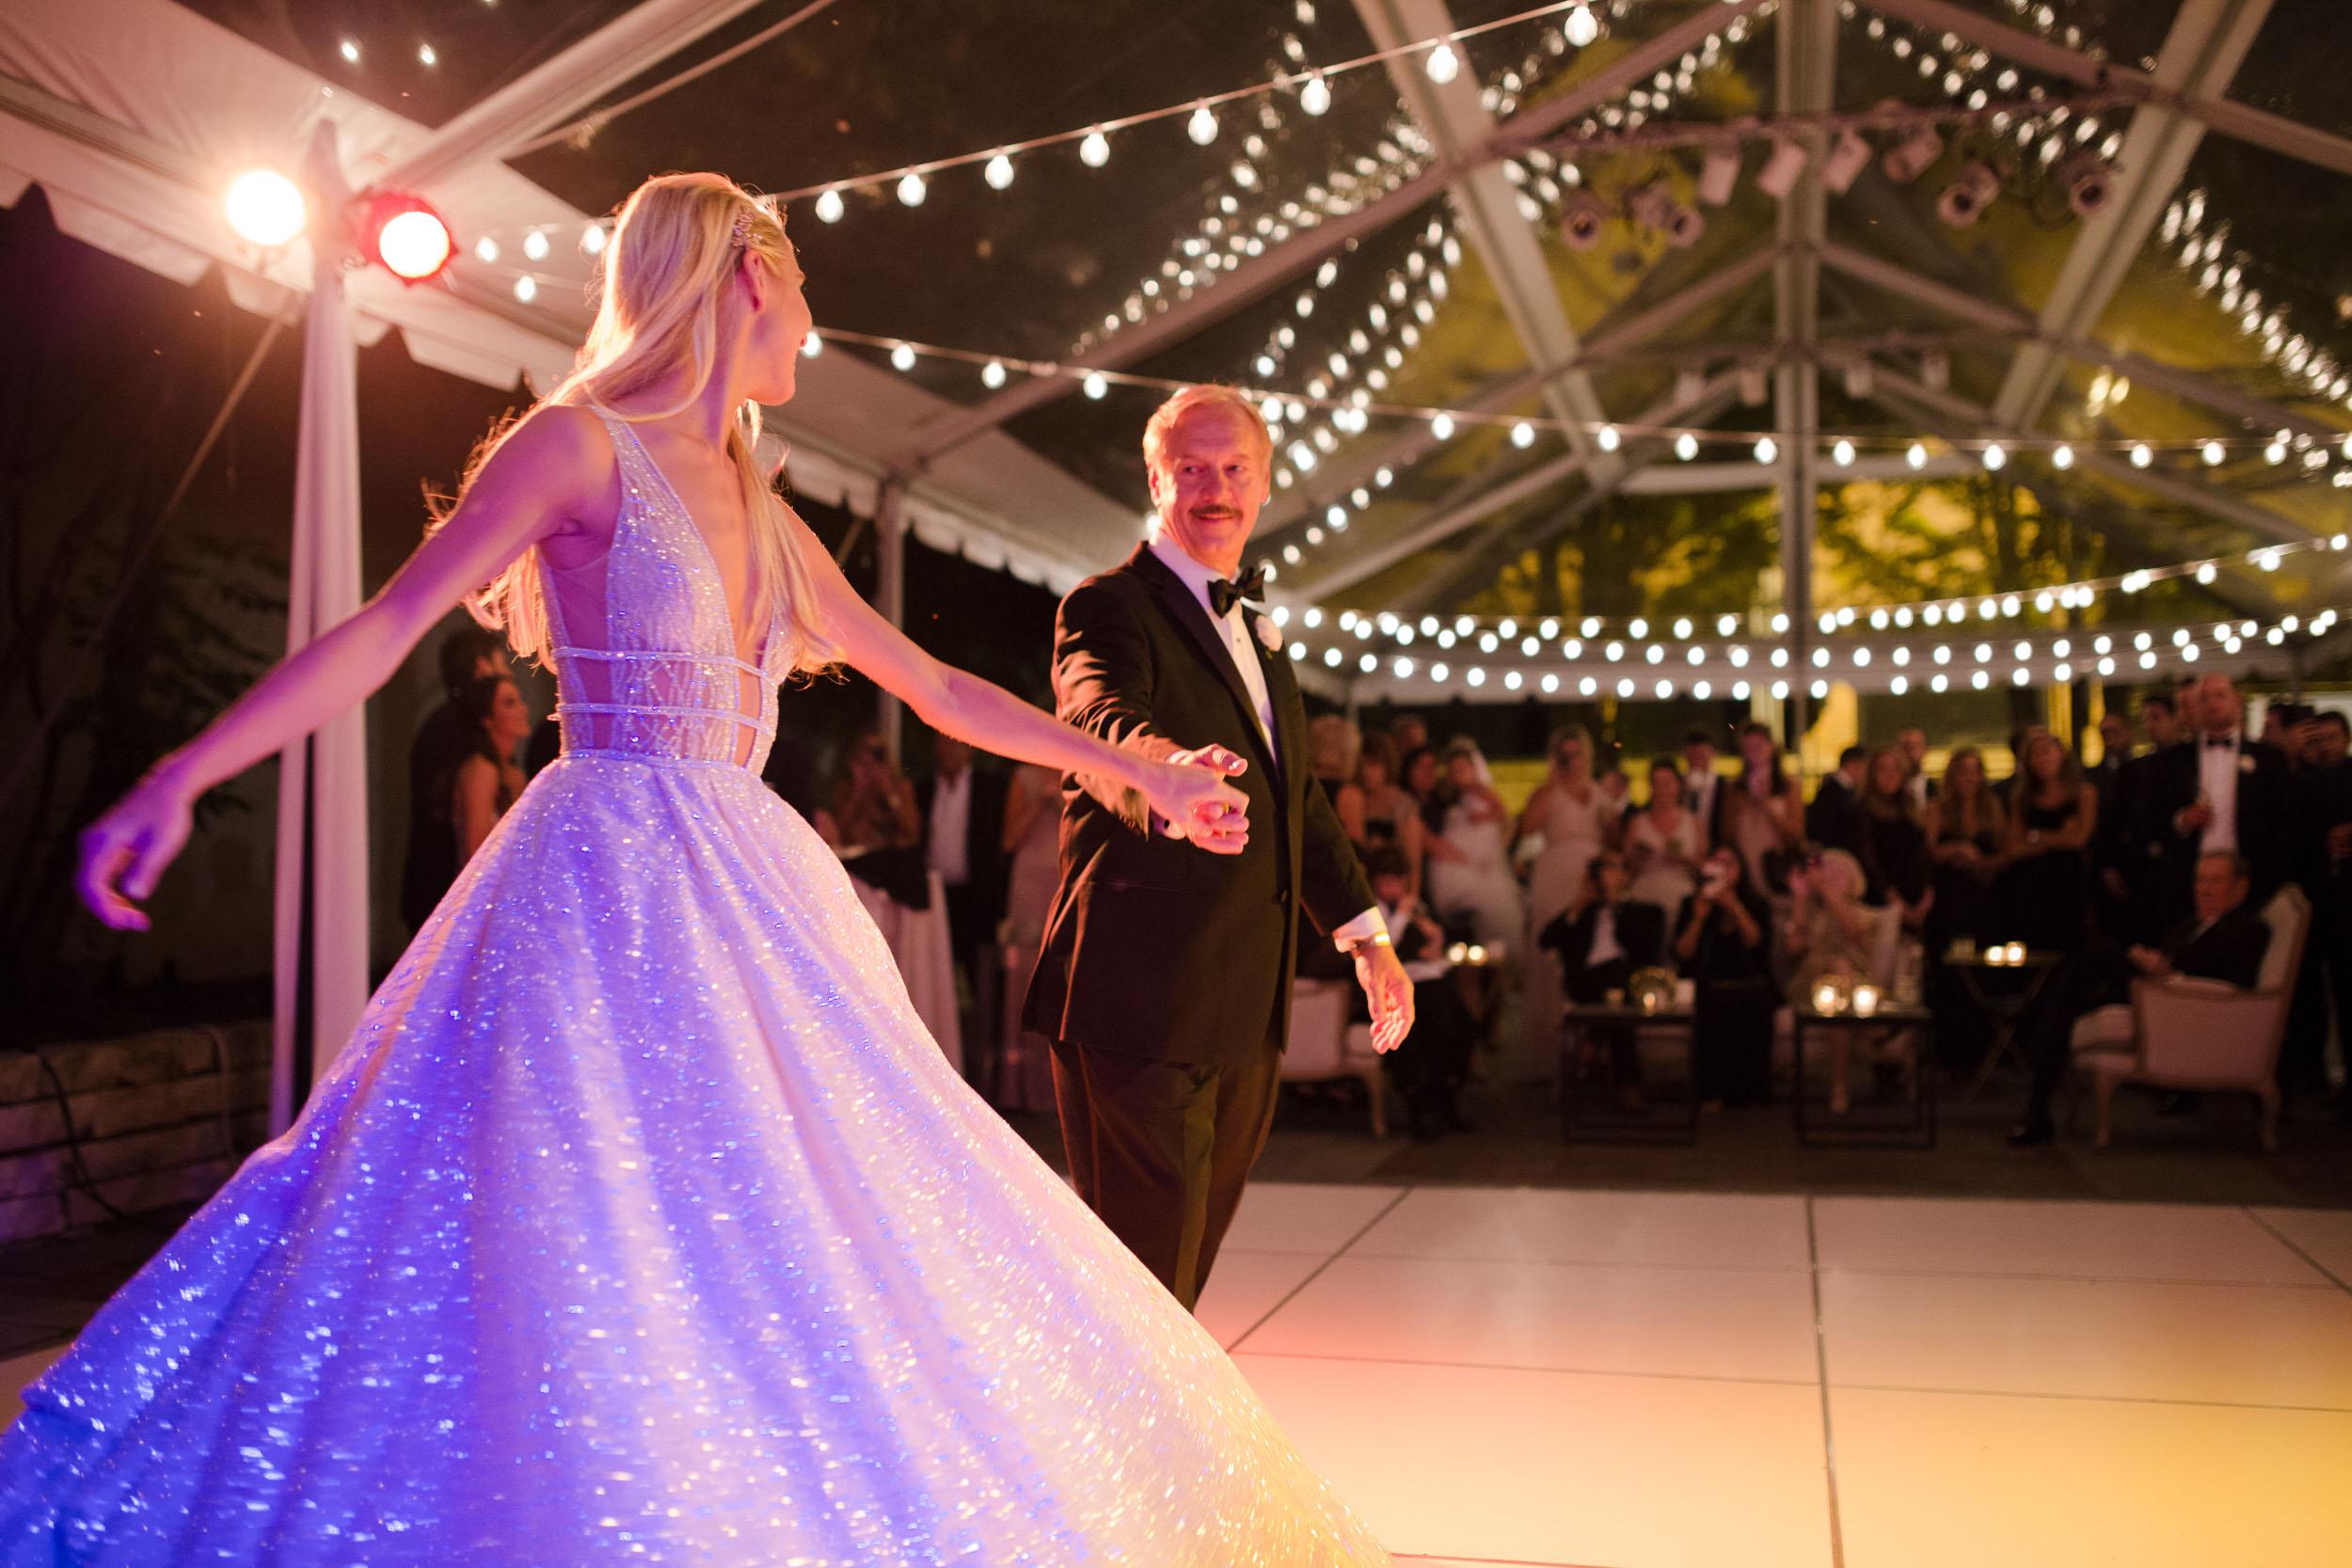 chicago-illuminating-co-wedding-photos-71.jpg